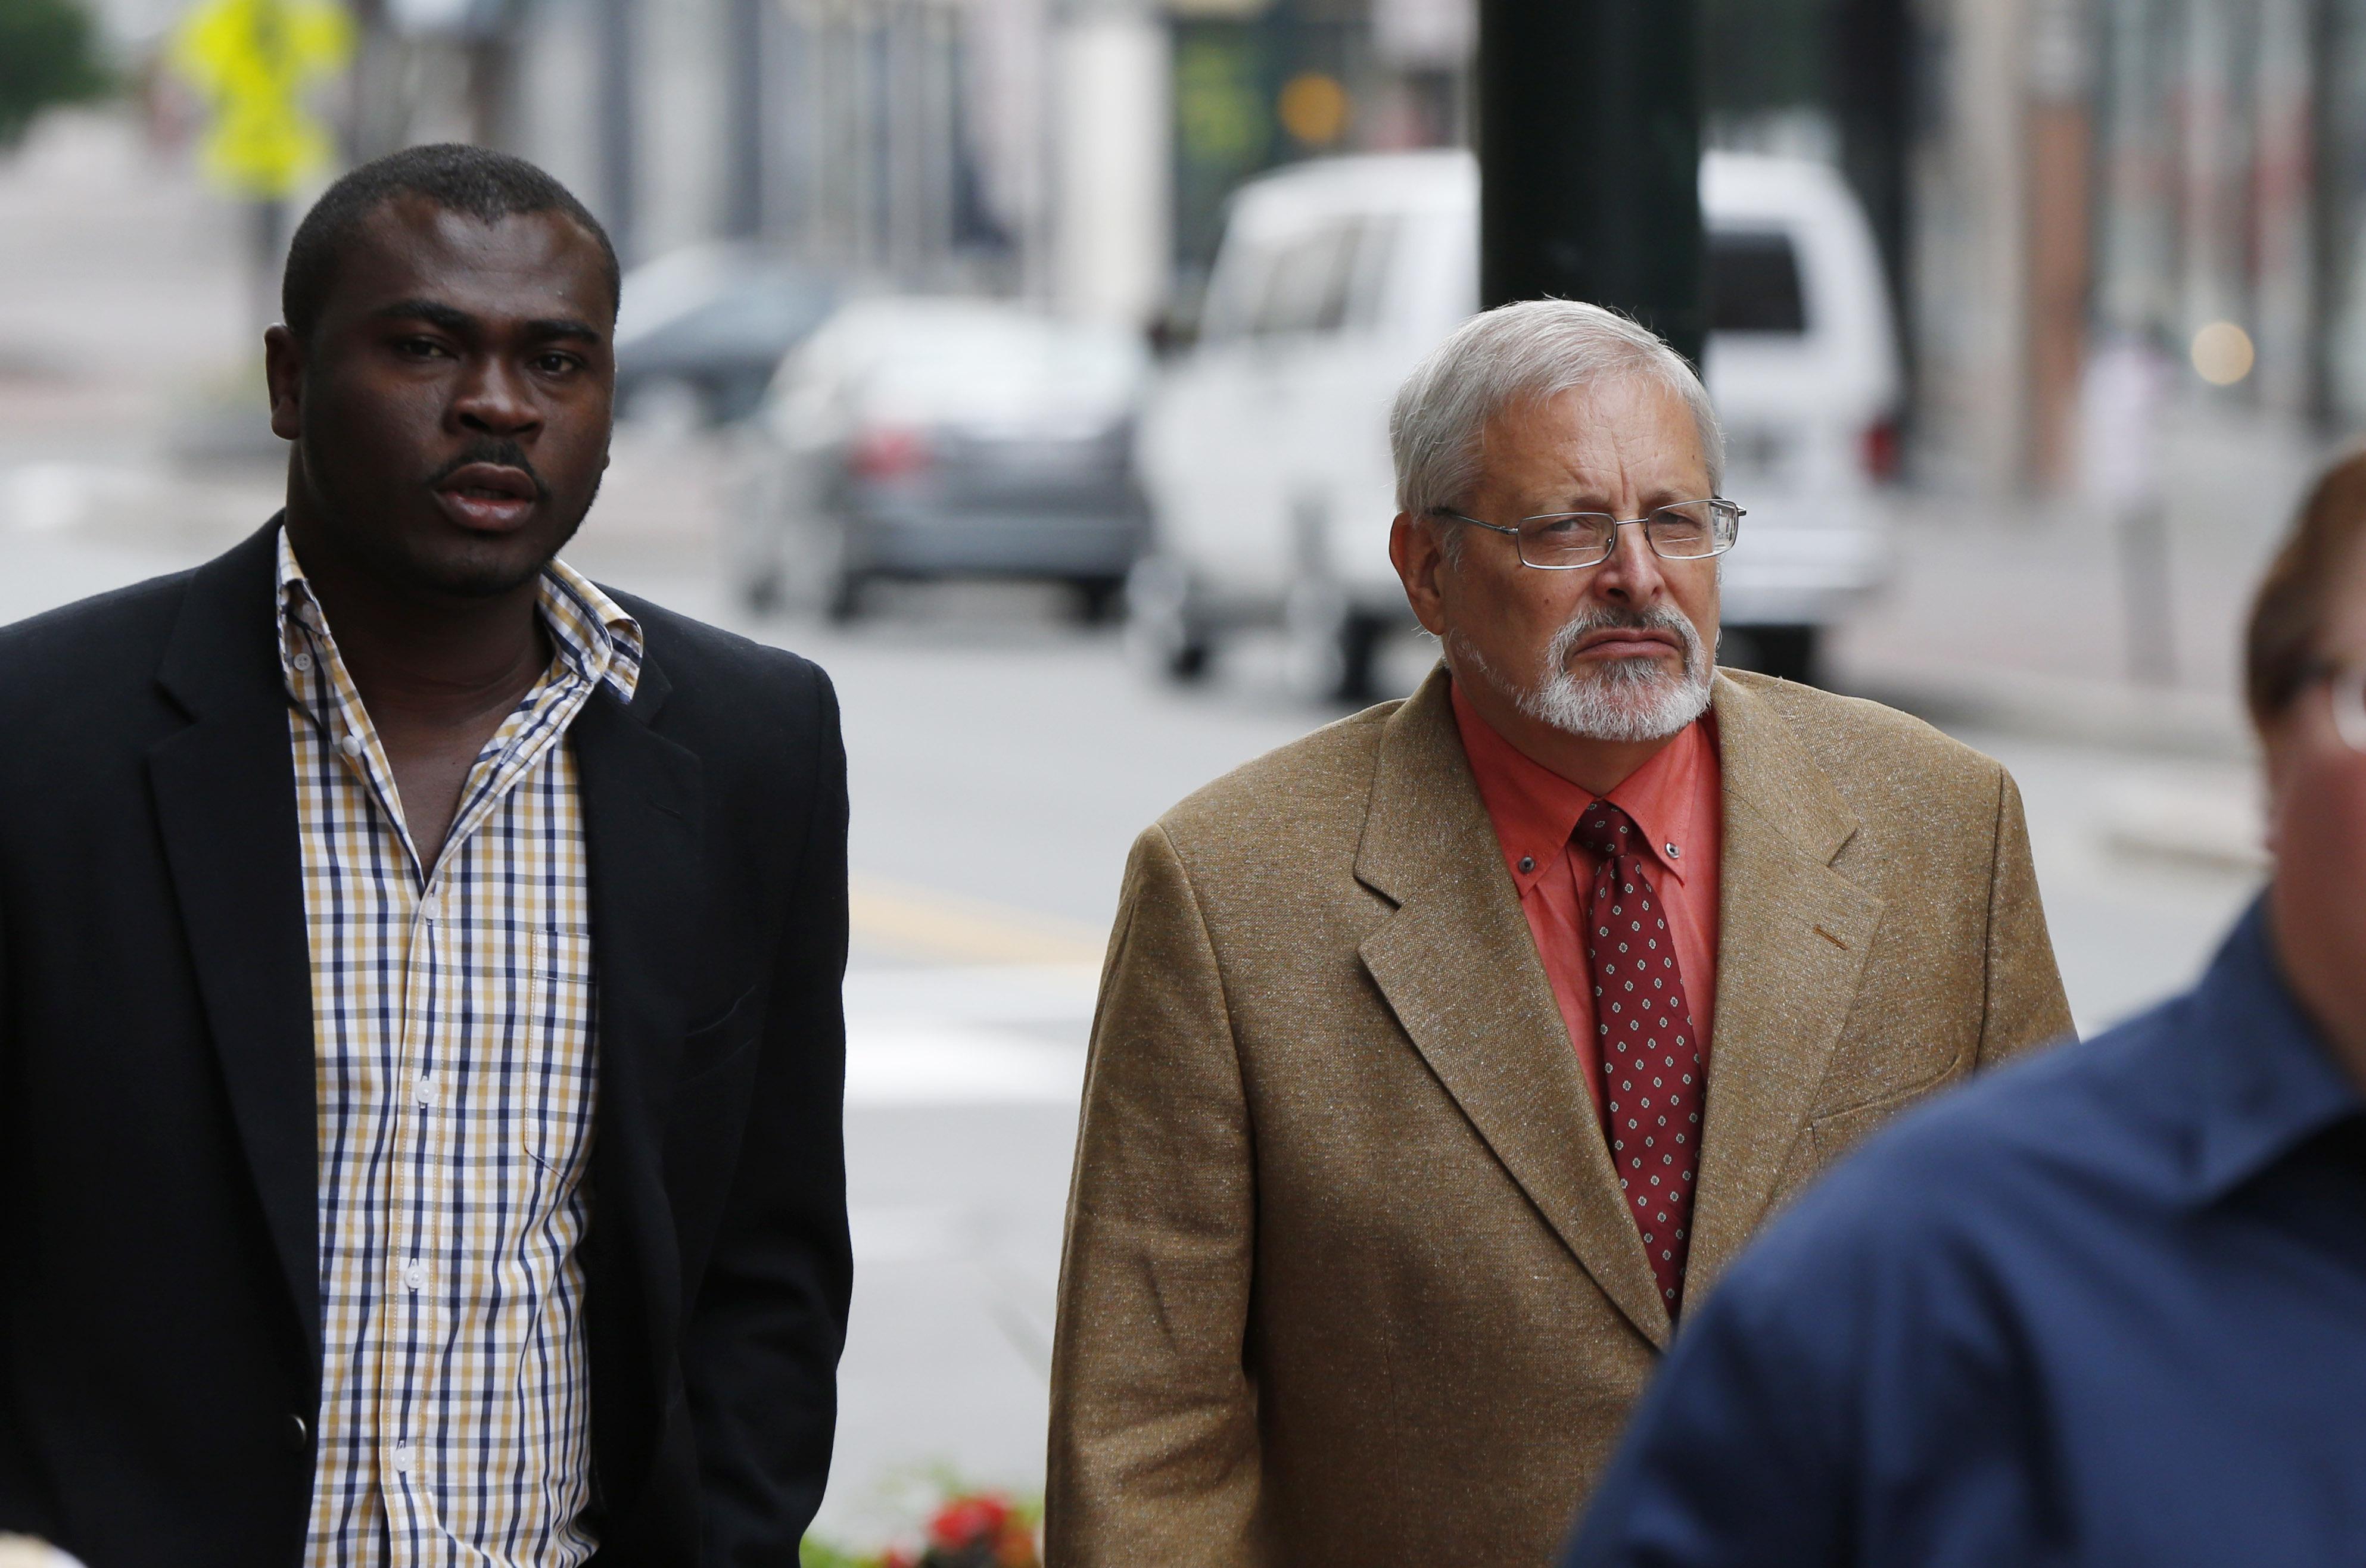 Defamation suit over Haiti sex abuse claim settled